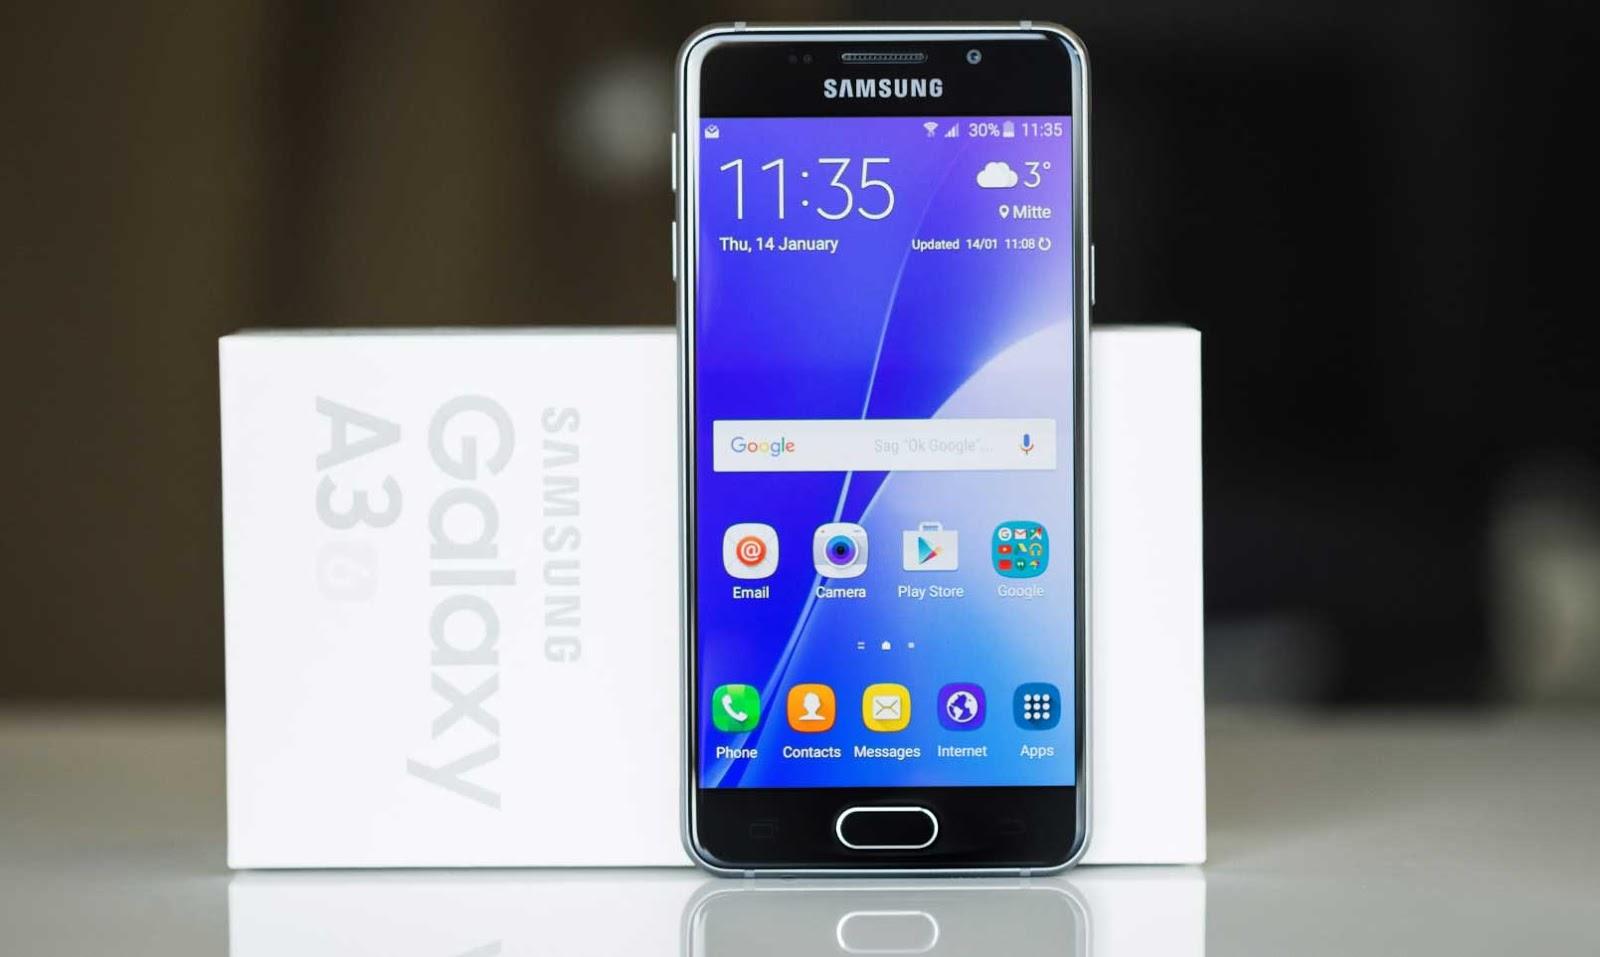 Harga Dan Spesifikasi Samsung Galaxy Series A Terbaru Februari 2017